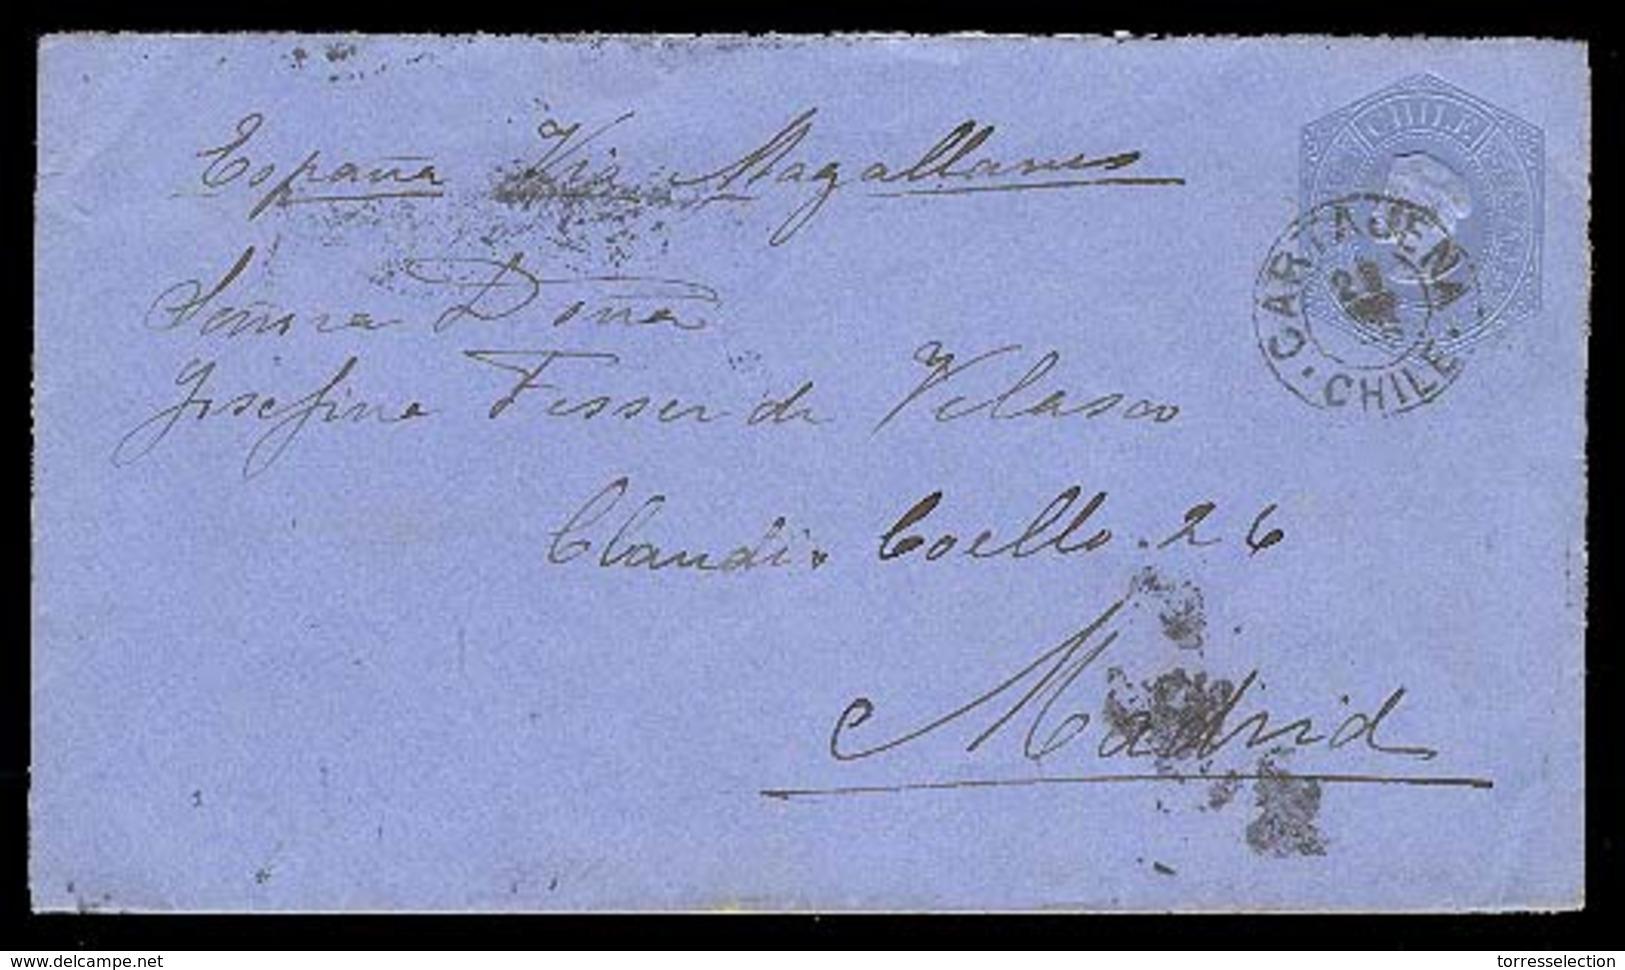 CHILE. 1896. Cartajena / Madrid - España. Entero Postal. Raro Destino En Este Periodo. - Chile